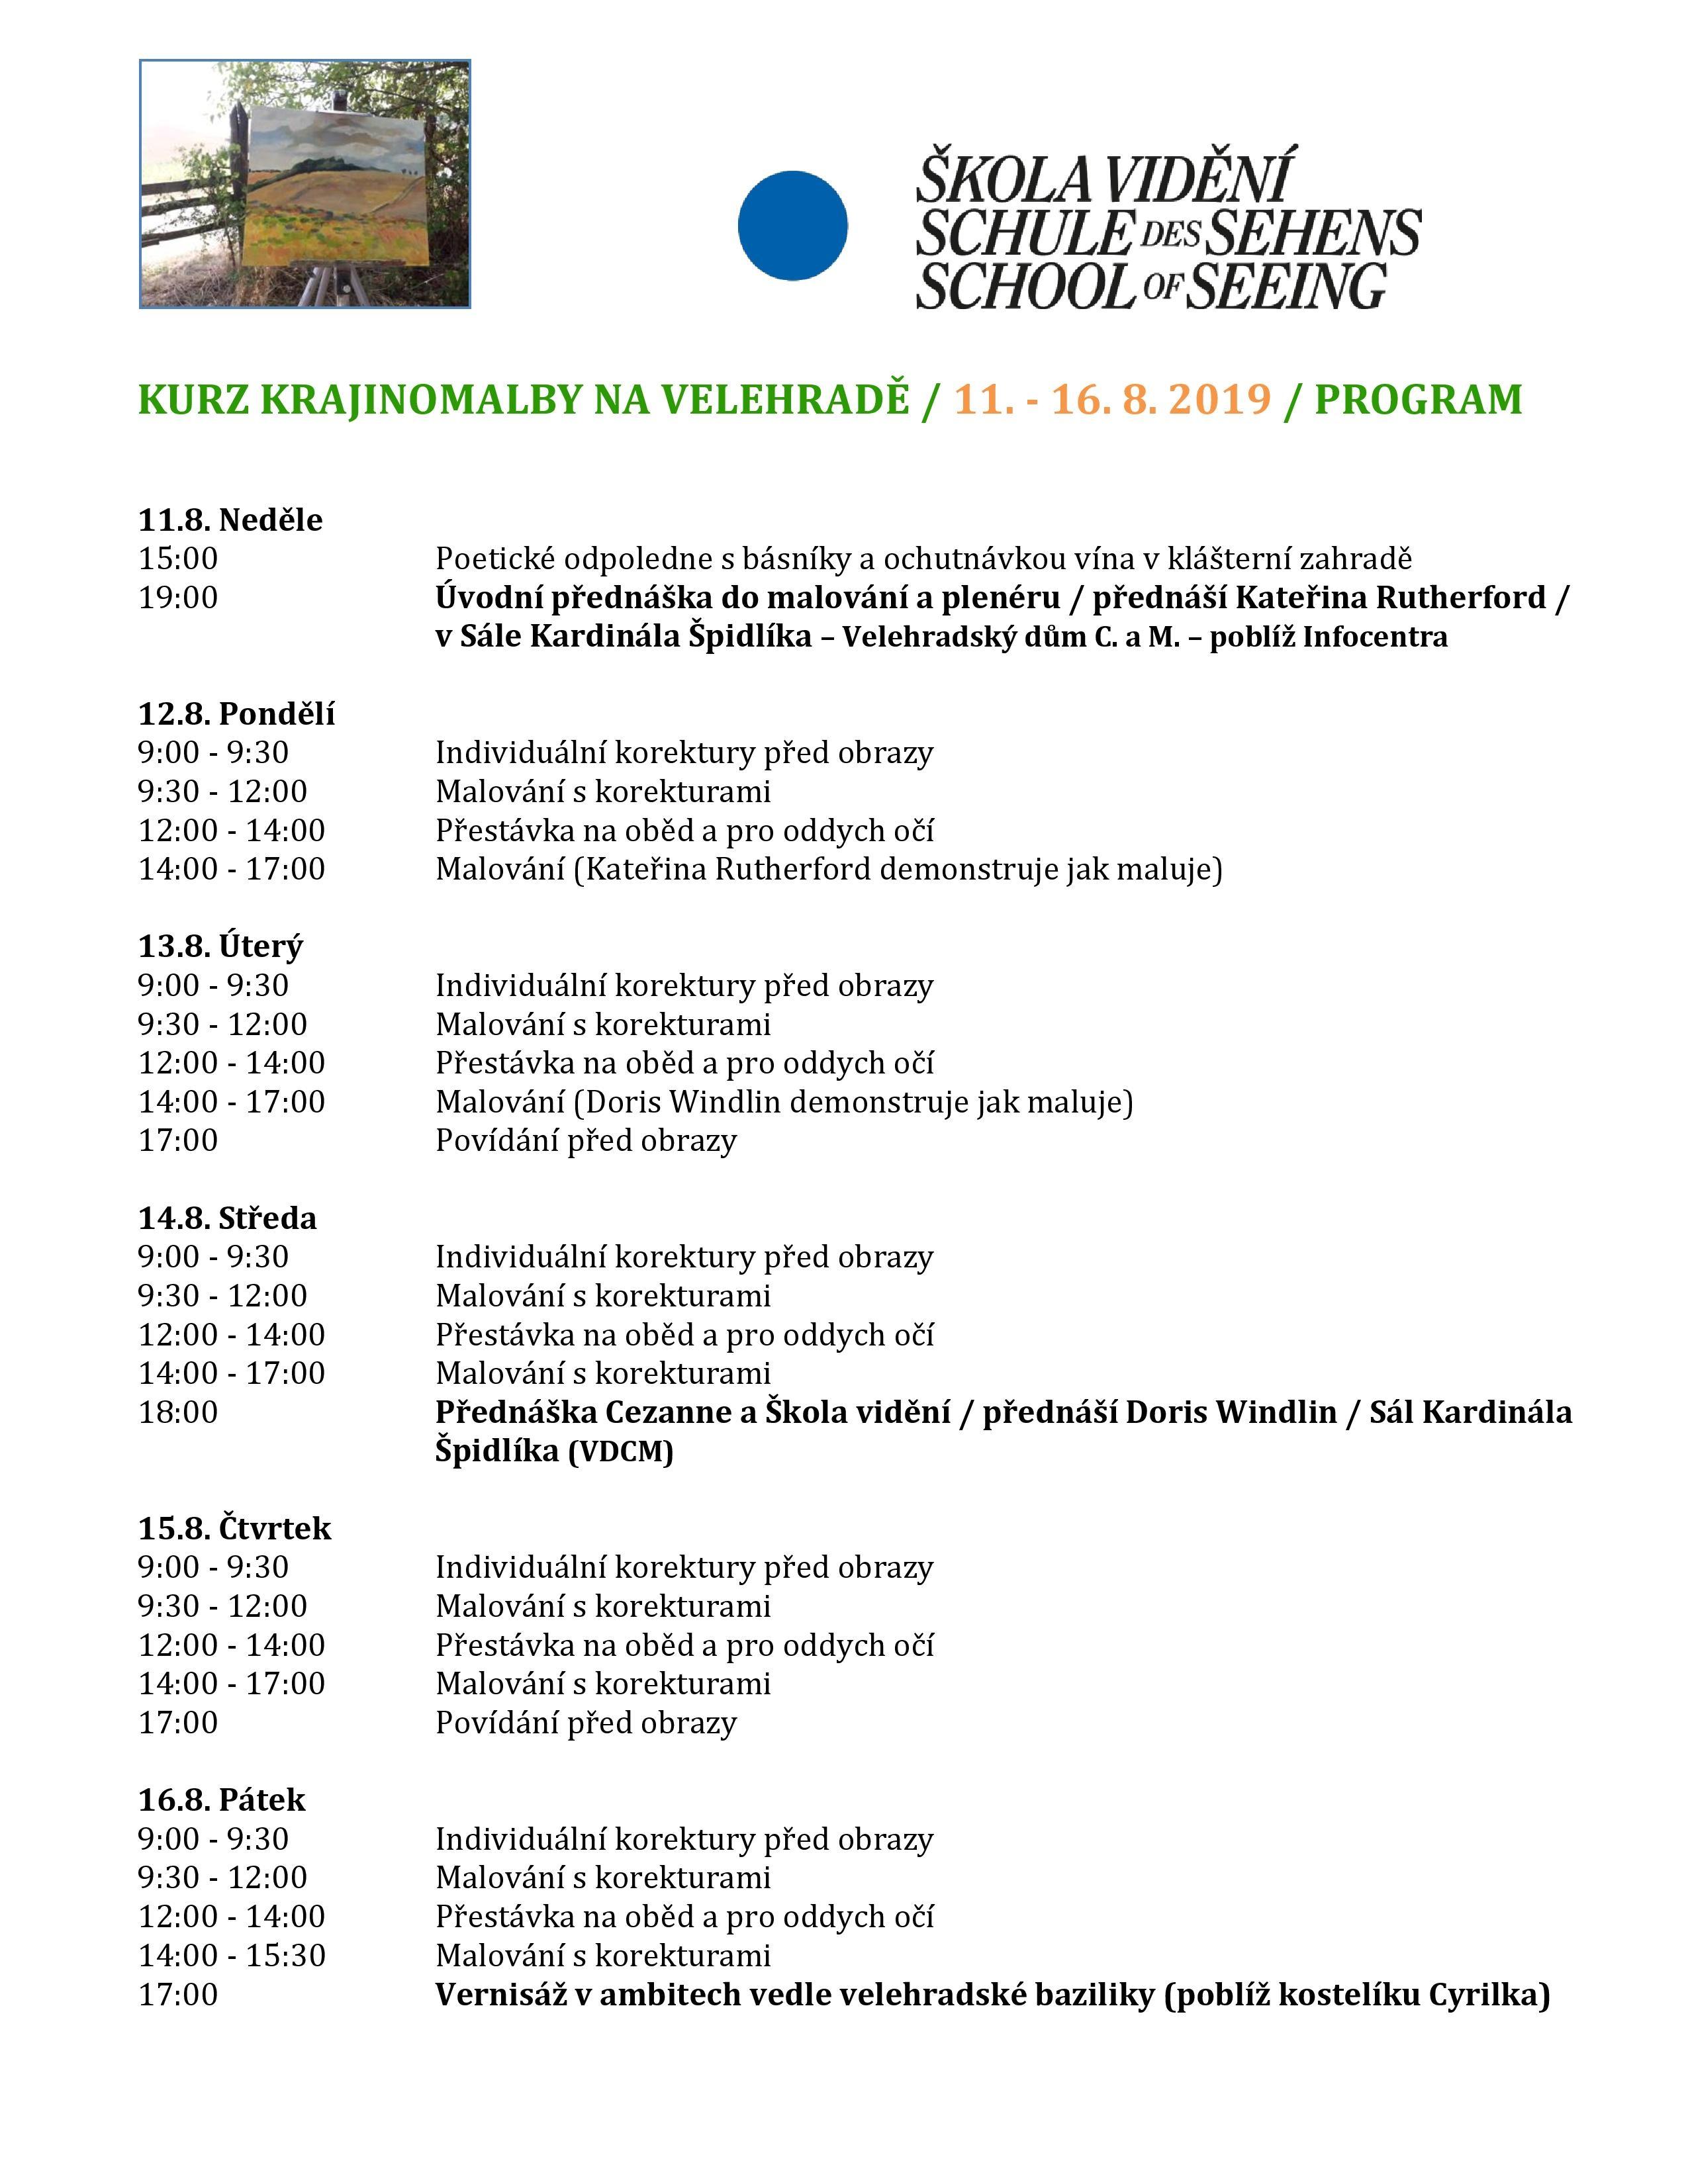 Krajinomalba - VELEHRAD 2019 - program-page-001 (2)